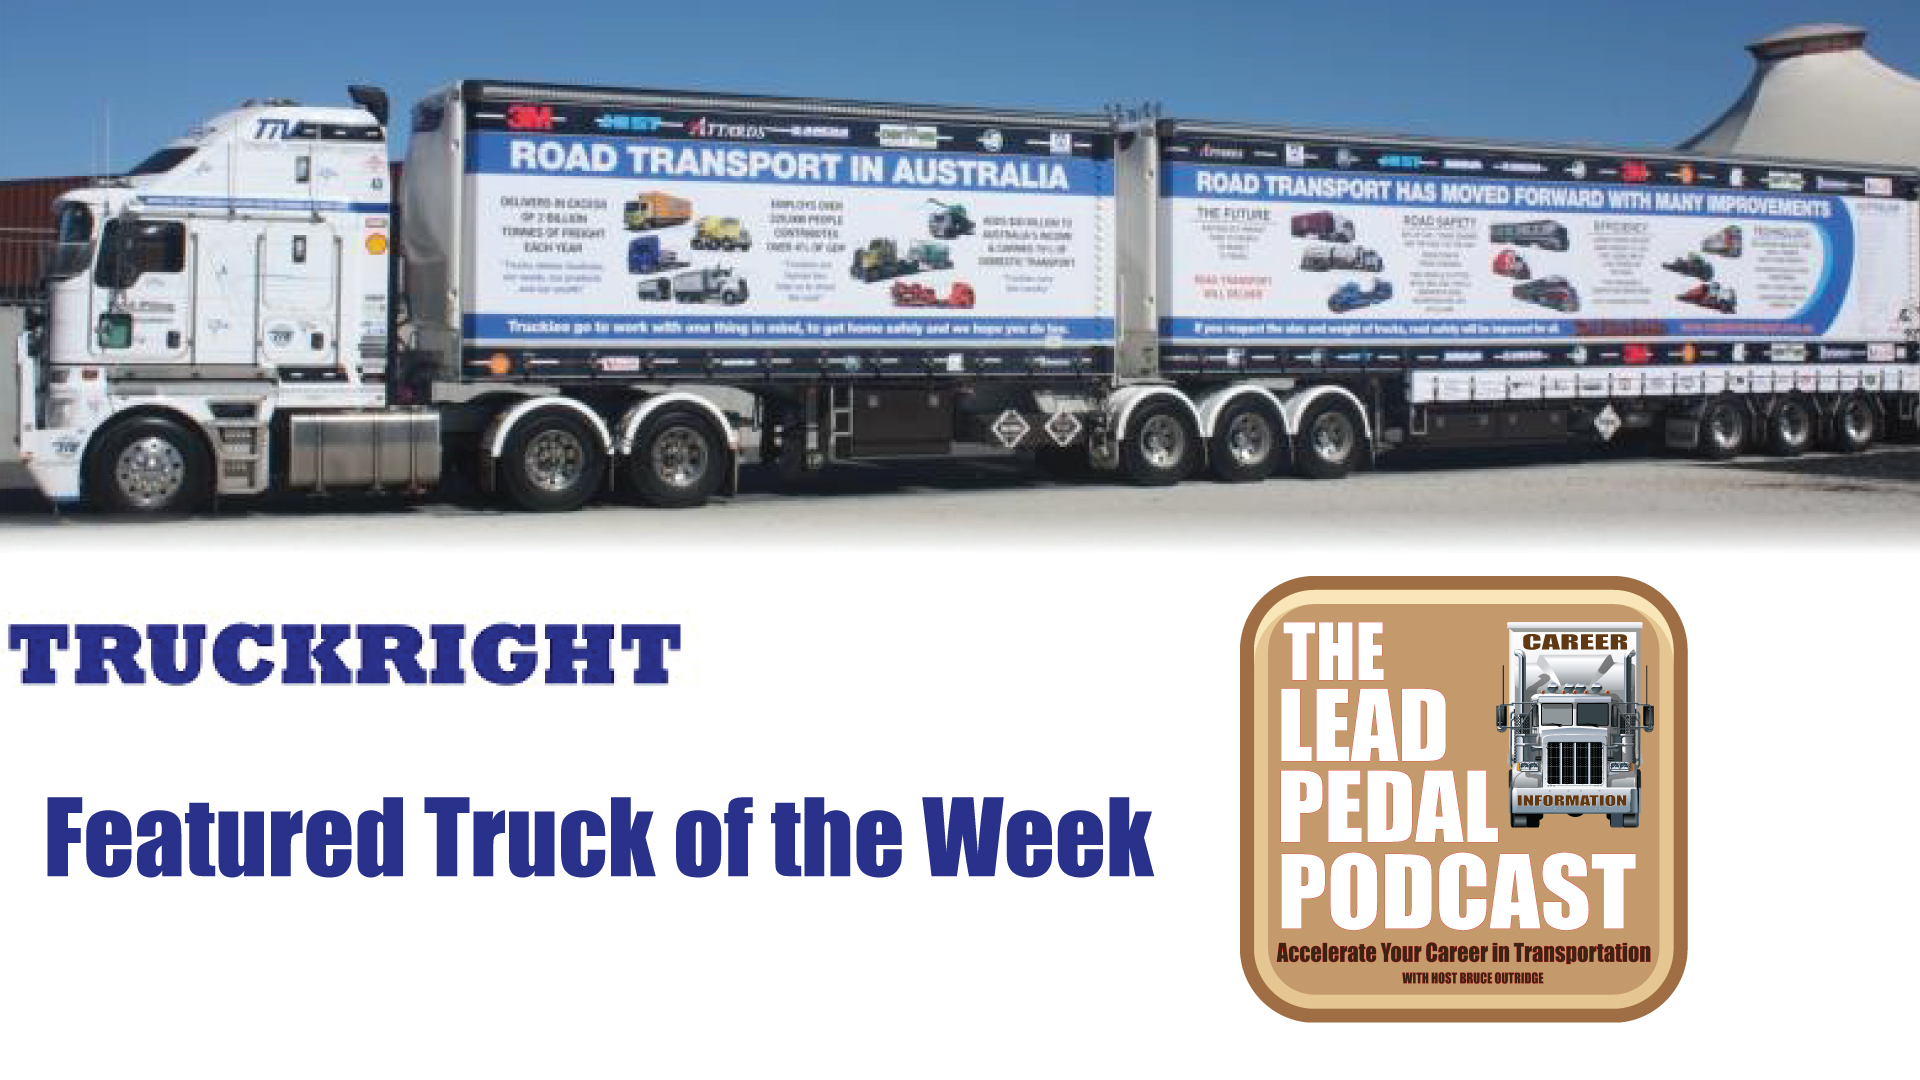 Truckright